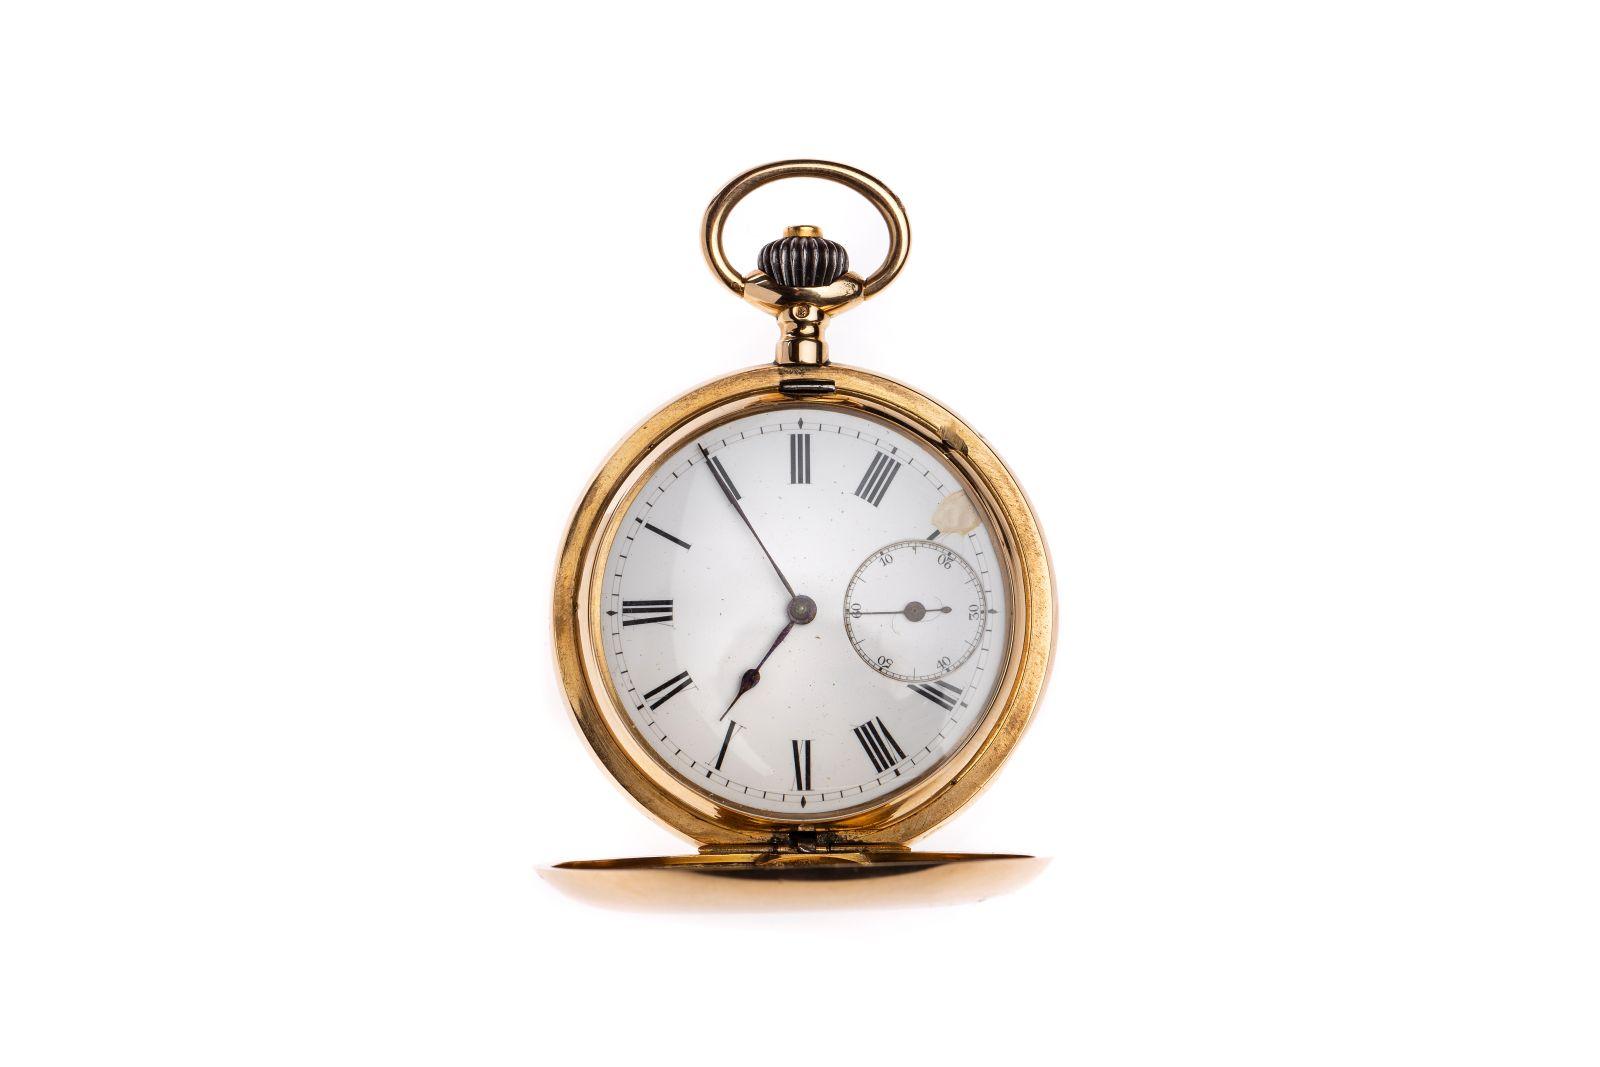 #16 Pocket watch | Doppelmantel Tachenuhr Image